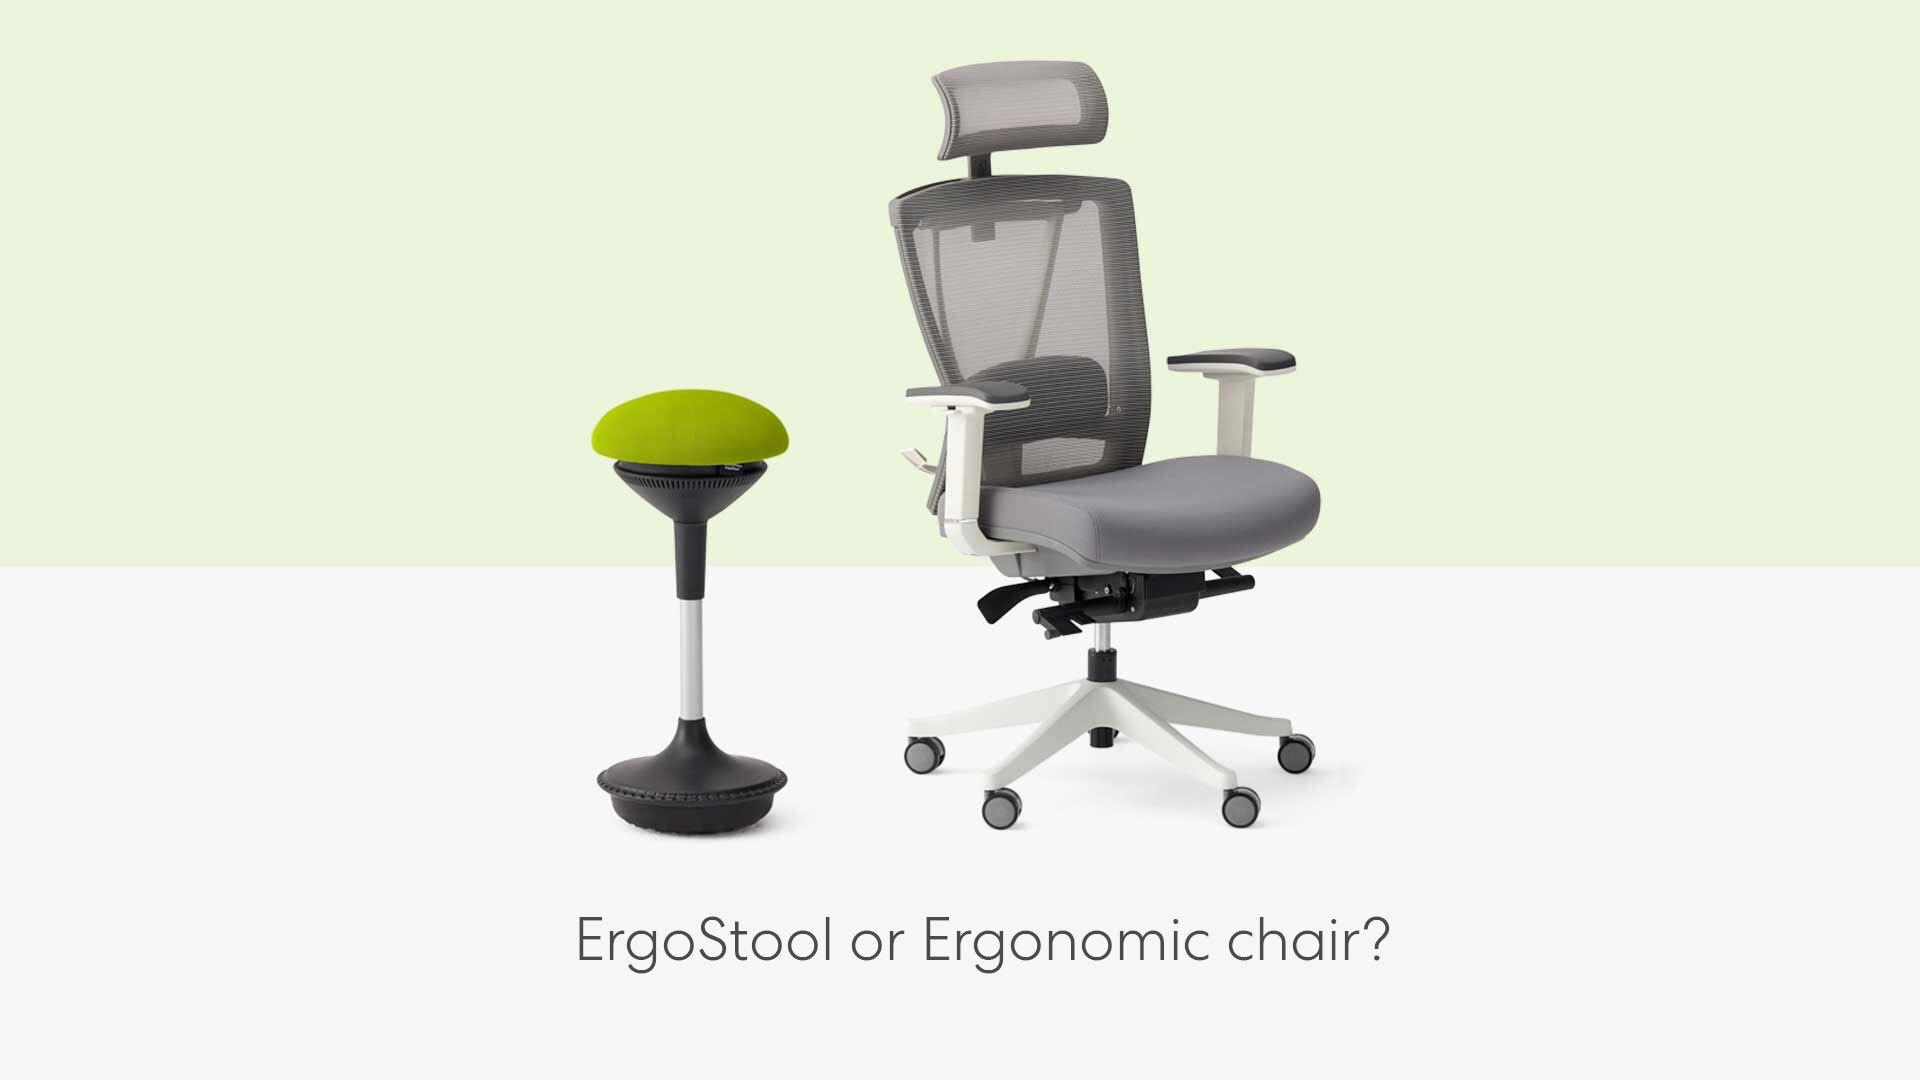 image relates to ergonomic chair